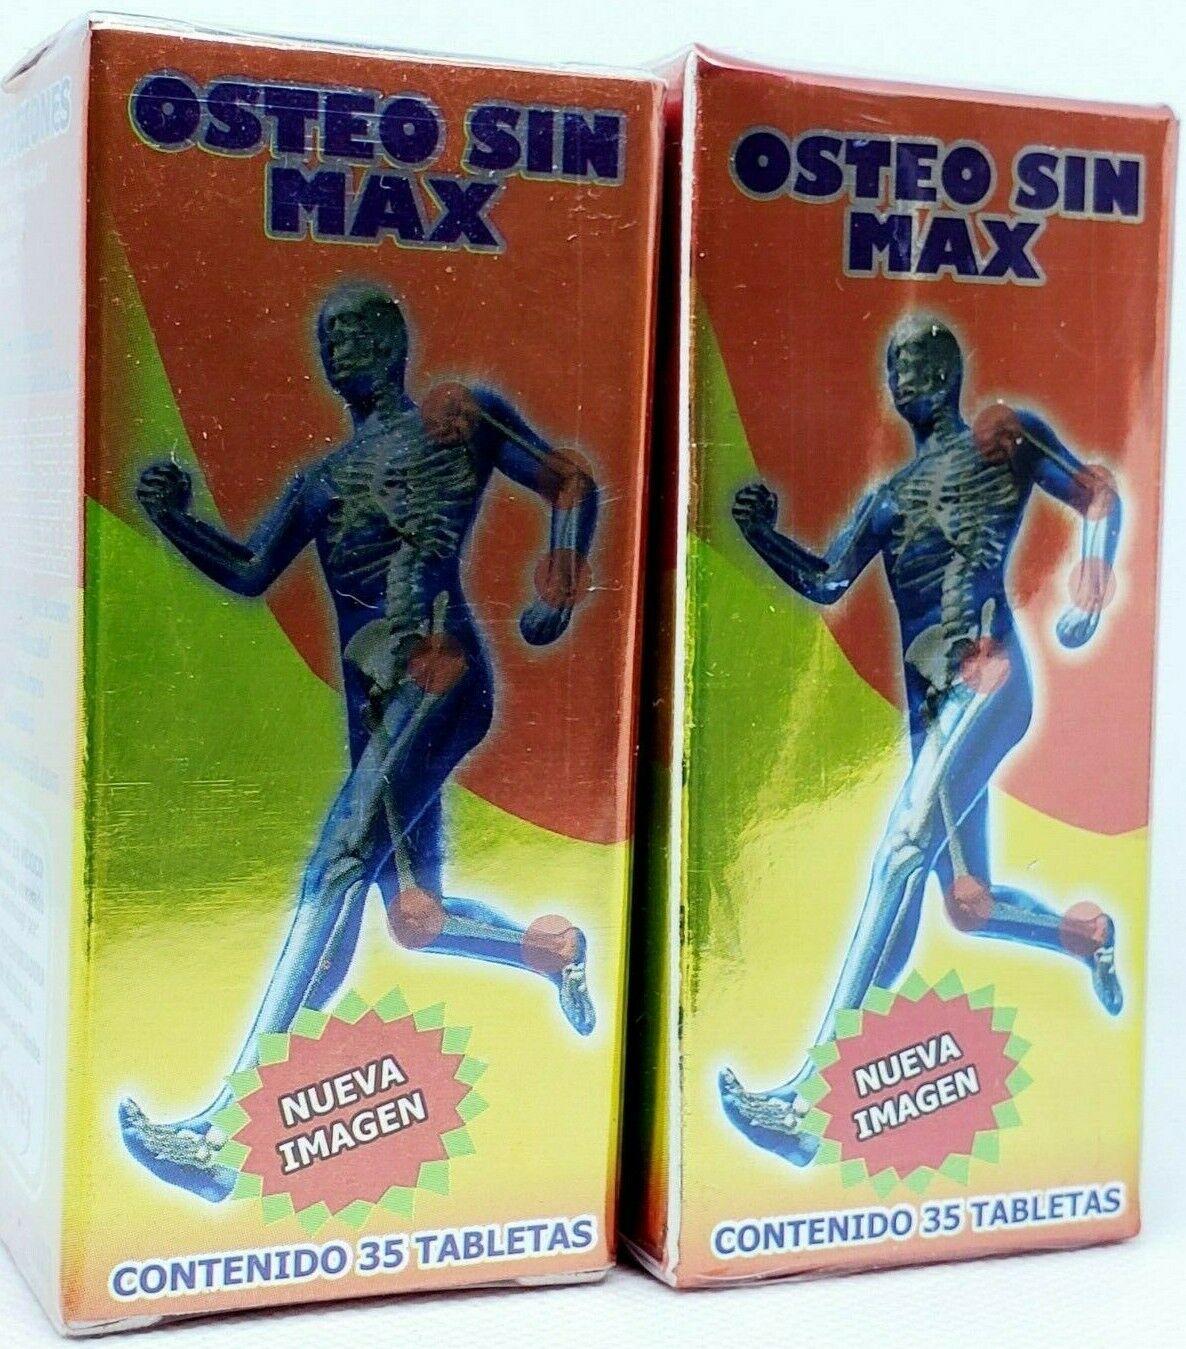 2  PACK OSTEO SIN MAX 100% ORIGINAL ARTHRITIS JOINT PAIN ARTRITIS OSTEOPOROSIS